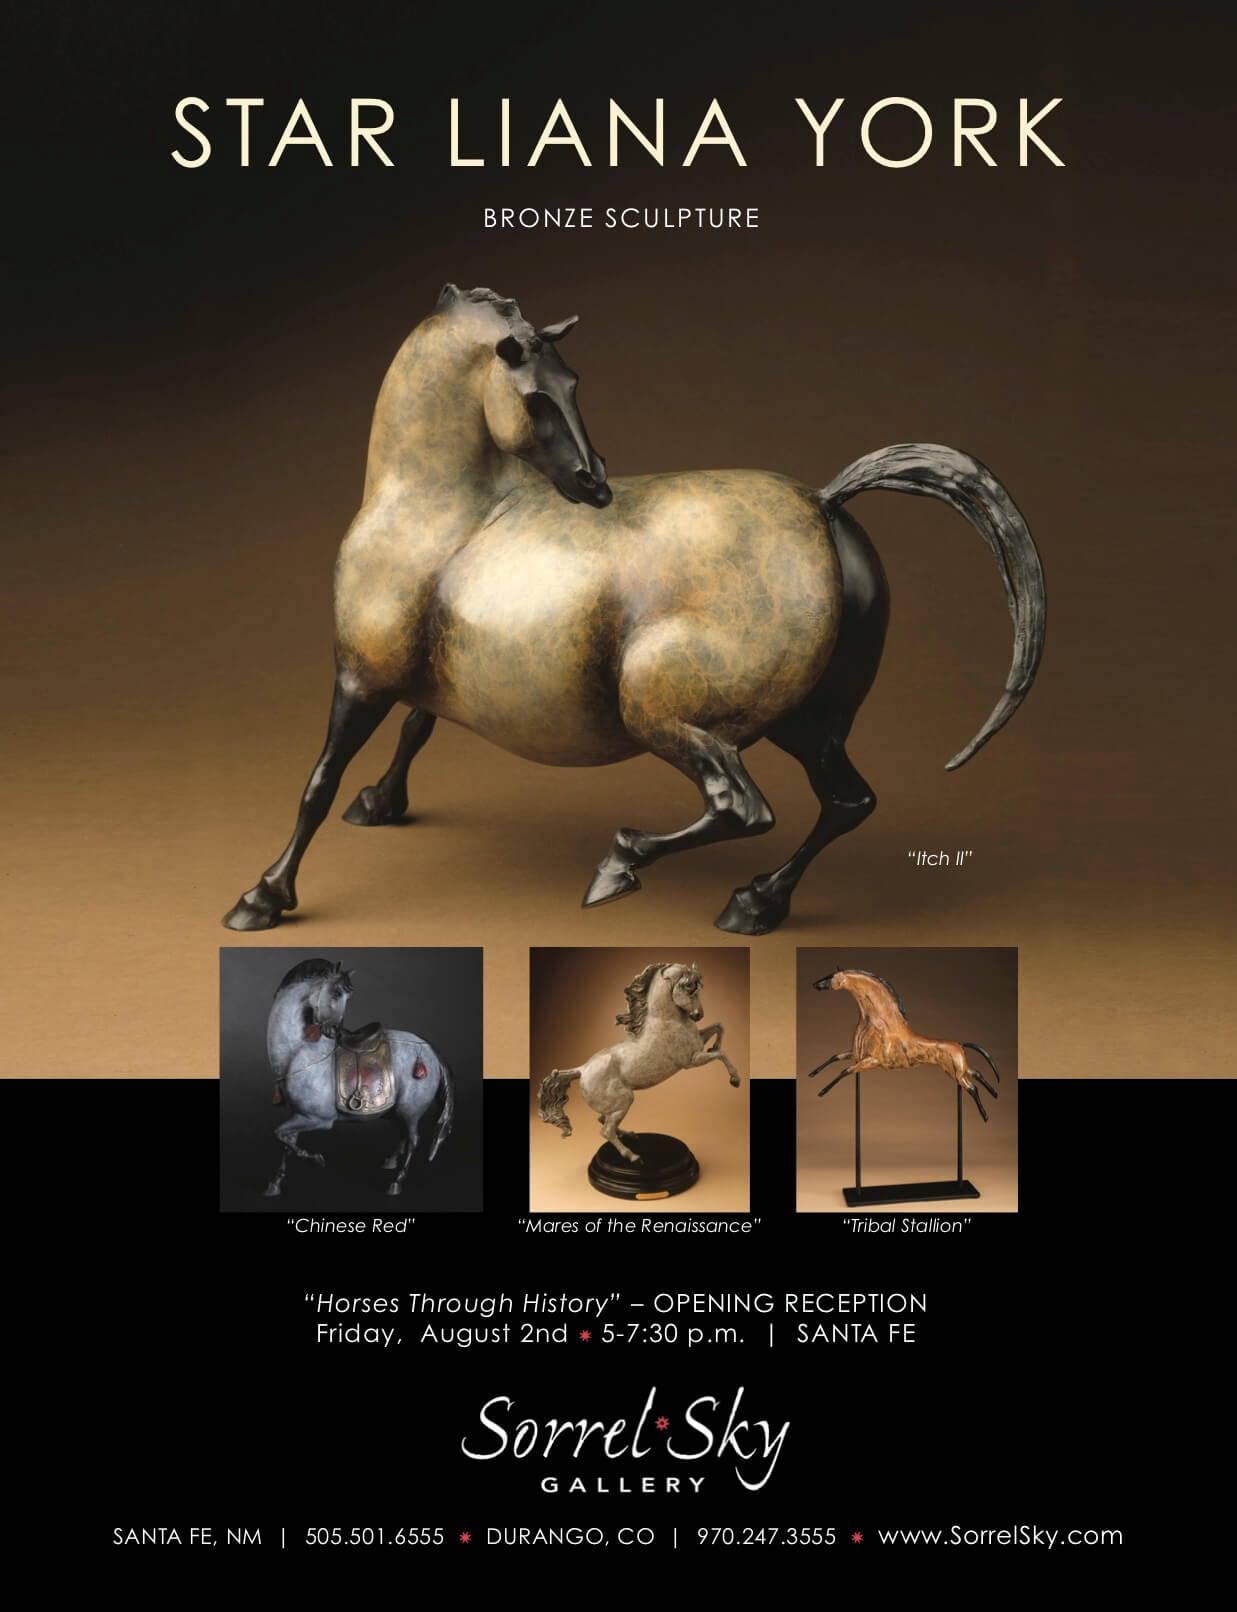 Star York. Star Liana York. Rock Art Mares. Bronze Sculpture. Horse Sculpture. Santa Fe Art Gallery. Horses Through History. Sorrel Sky Gallery. Rock Art Mares.